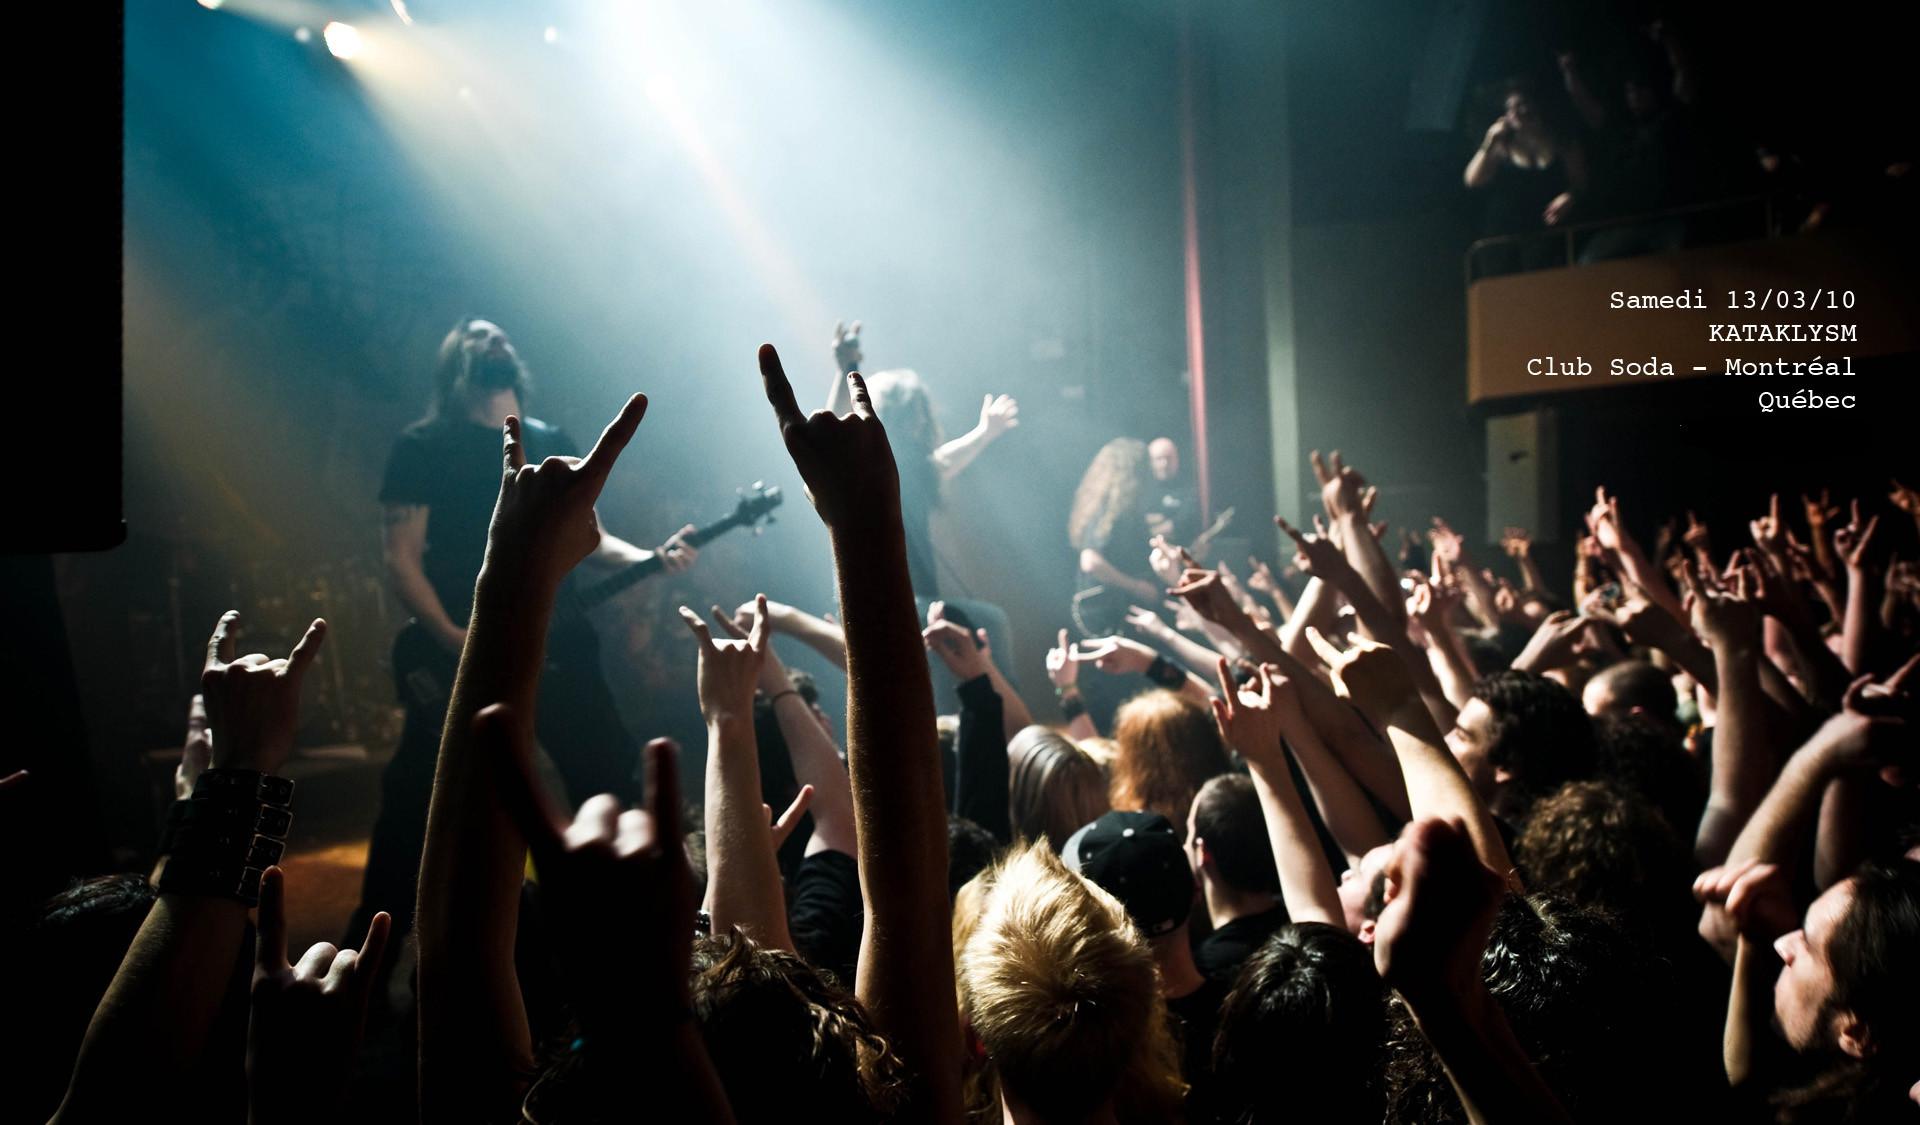 Concert Crowd Wallpaper (65+ Images